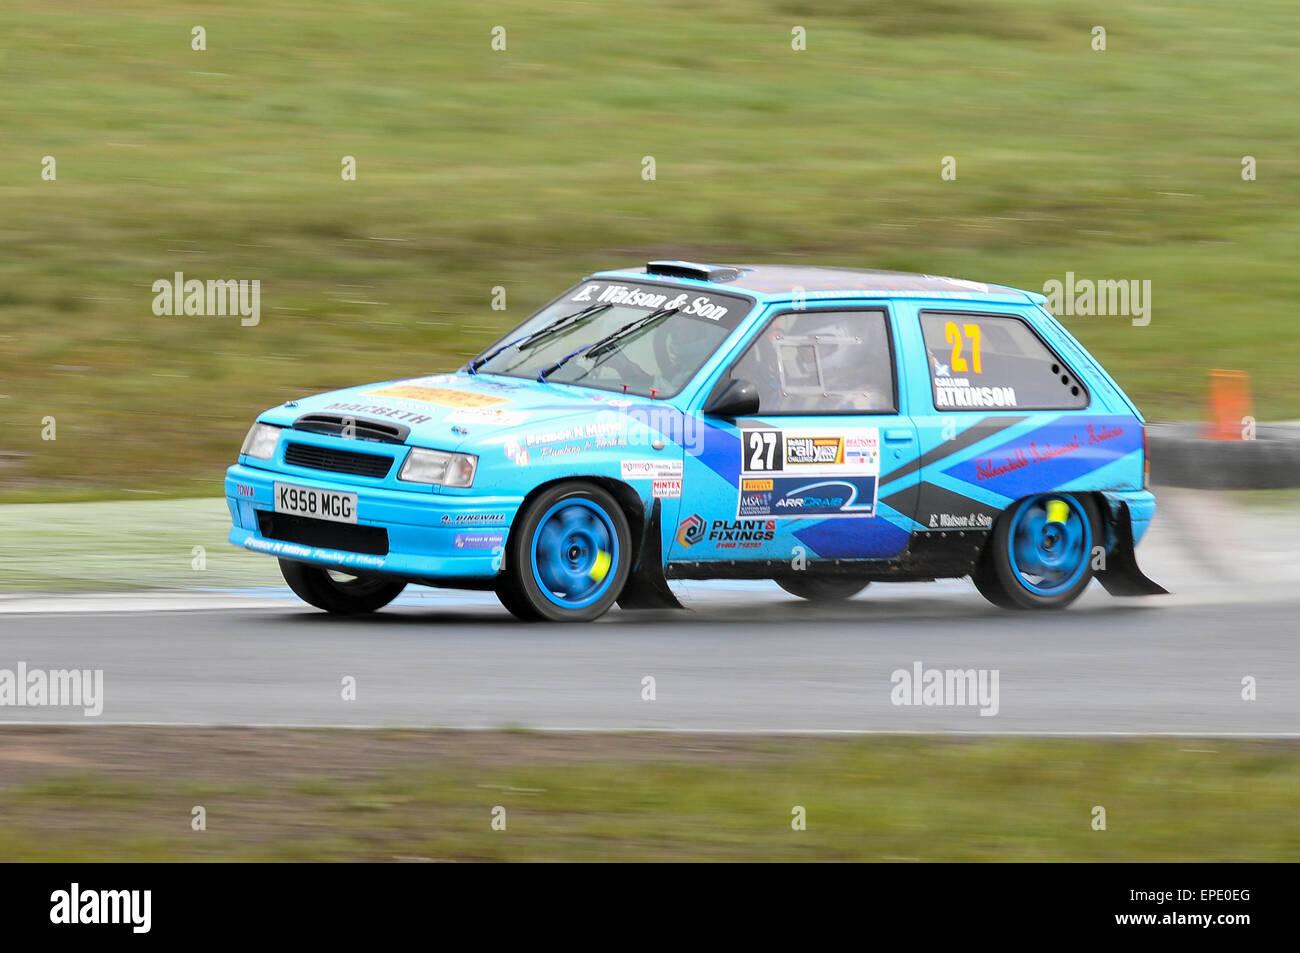 Vauxhall Nova Rally Car Stock Photos & Vauxhall Nova Rally Car Stock ...